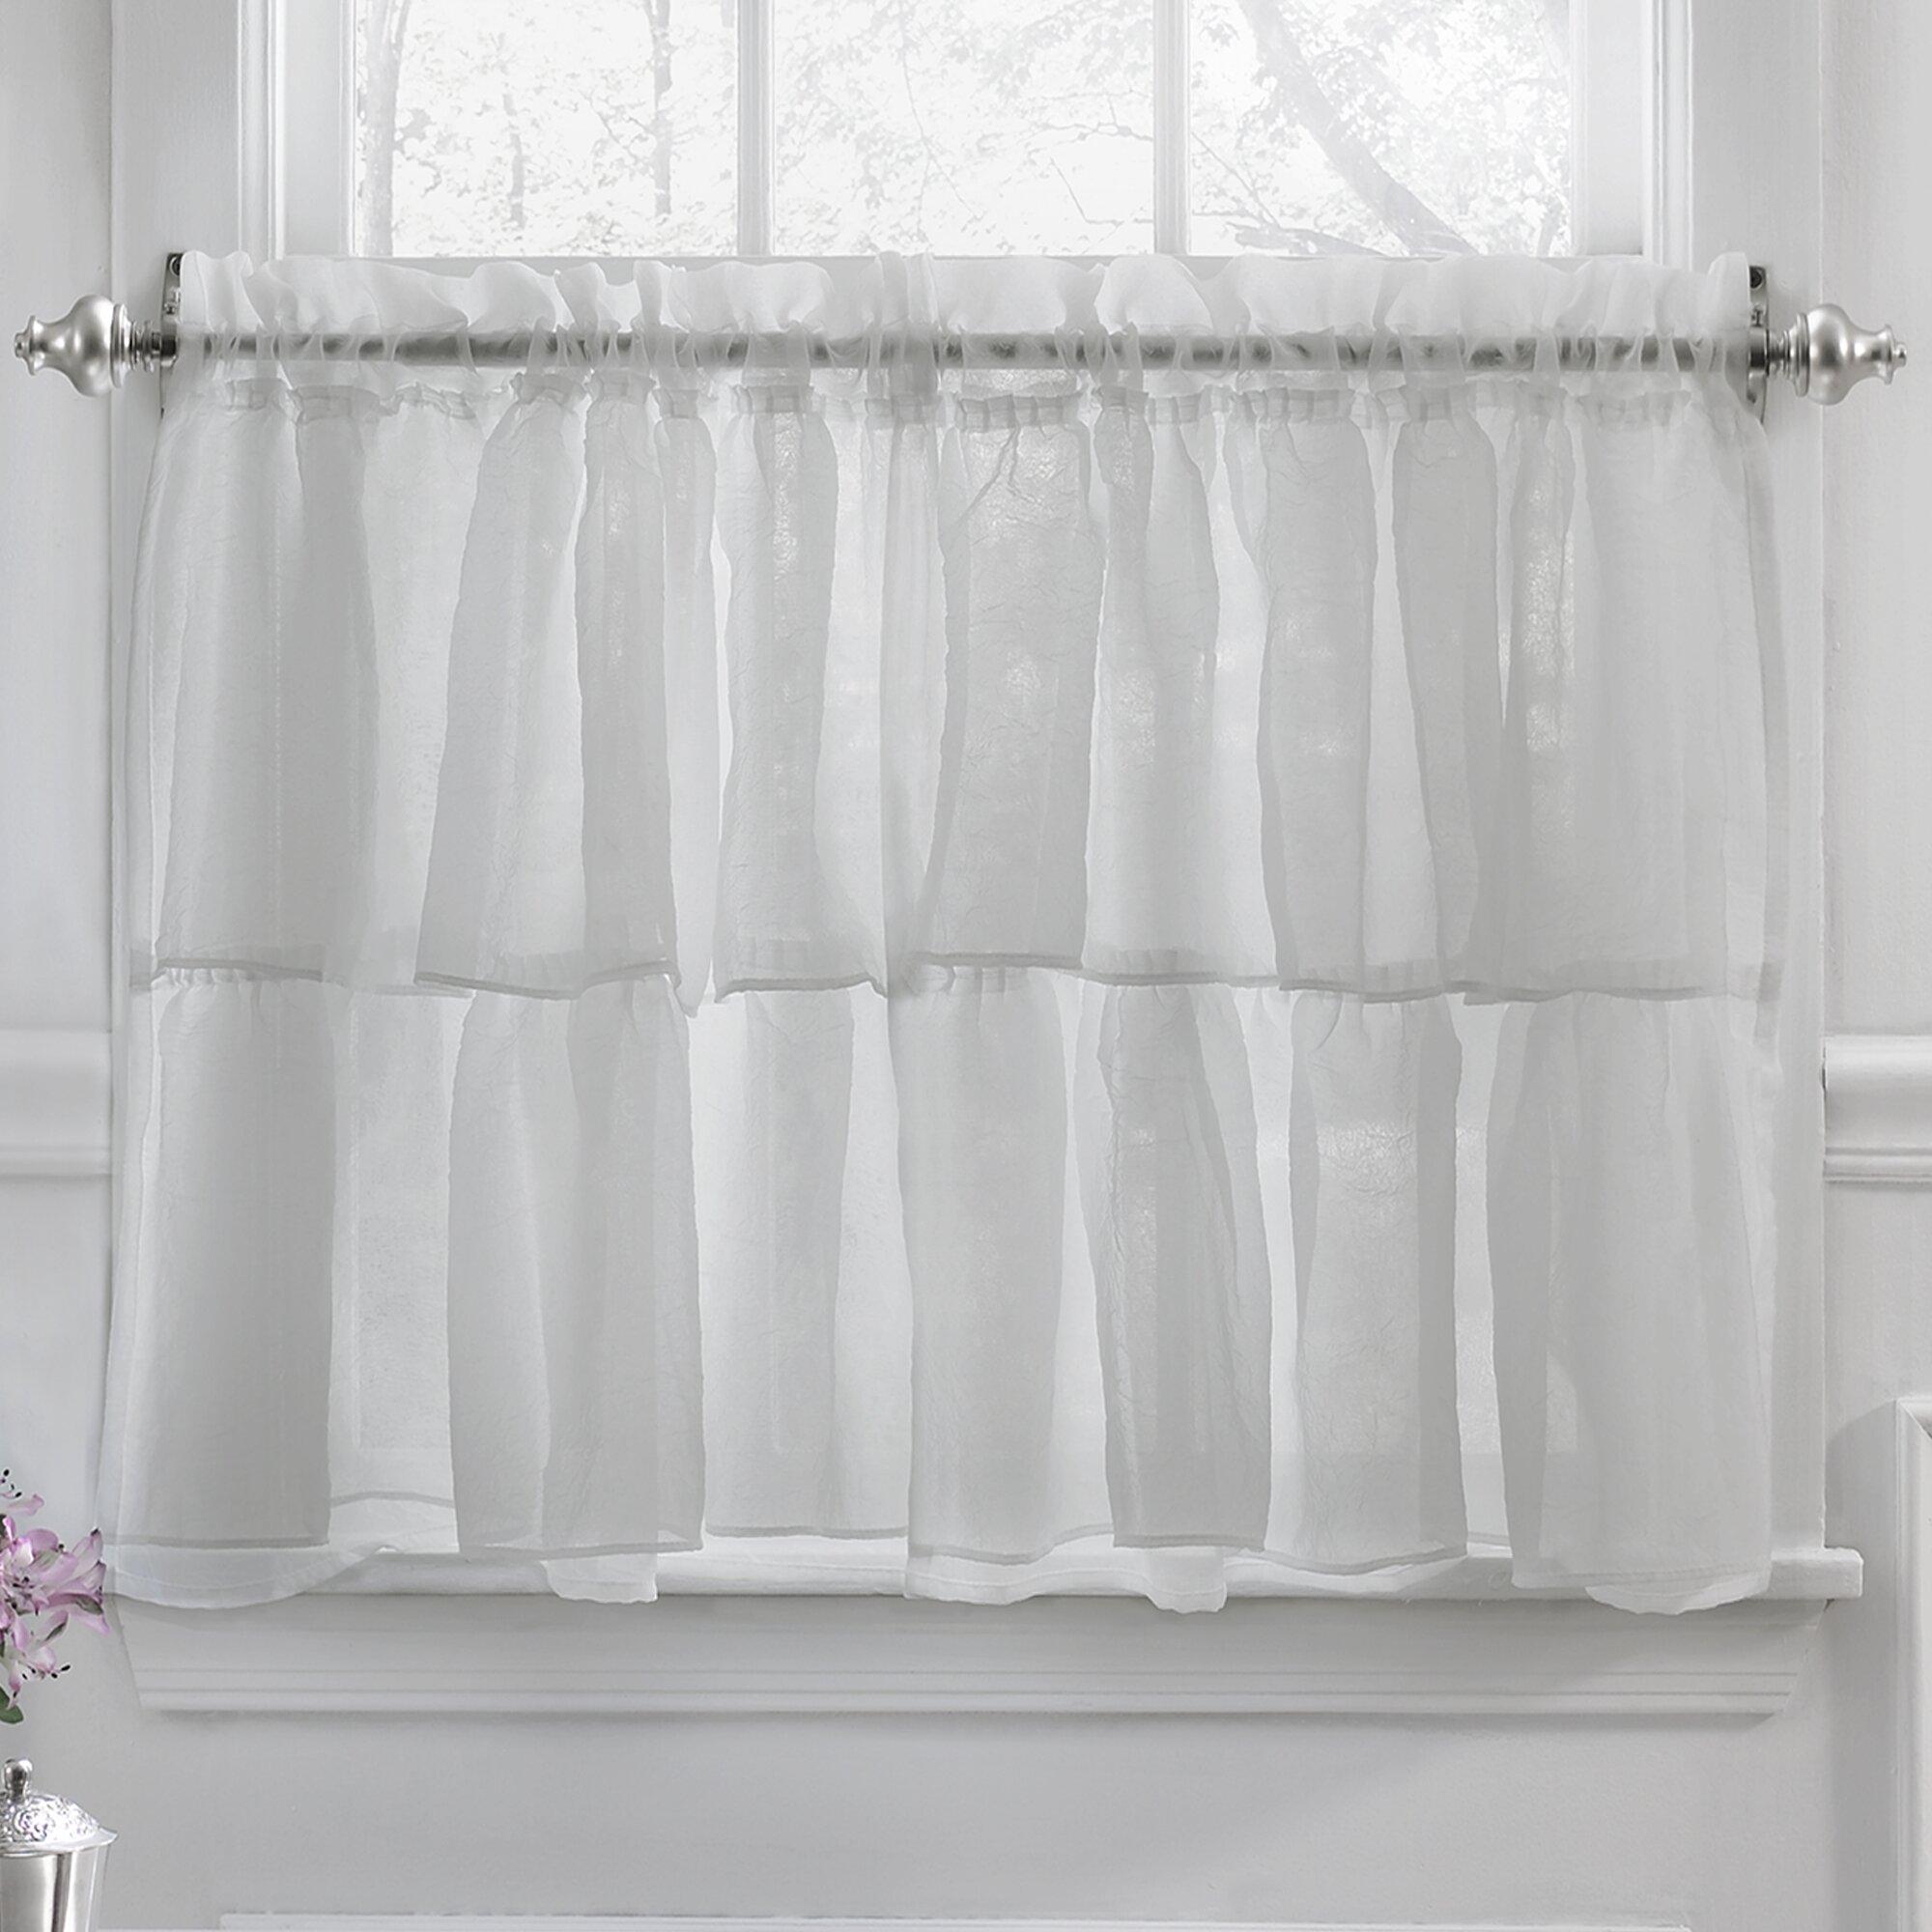 Ruffle window curtain - Elegant Crushed Voile Ruffle Kitchen Window Tier Curtain